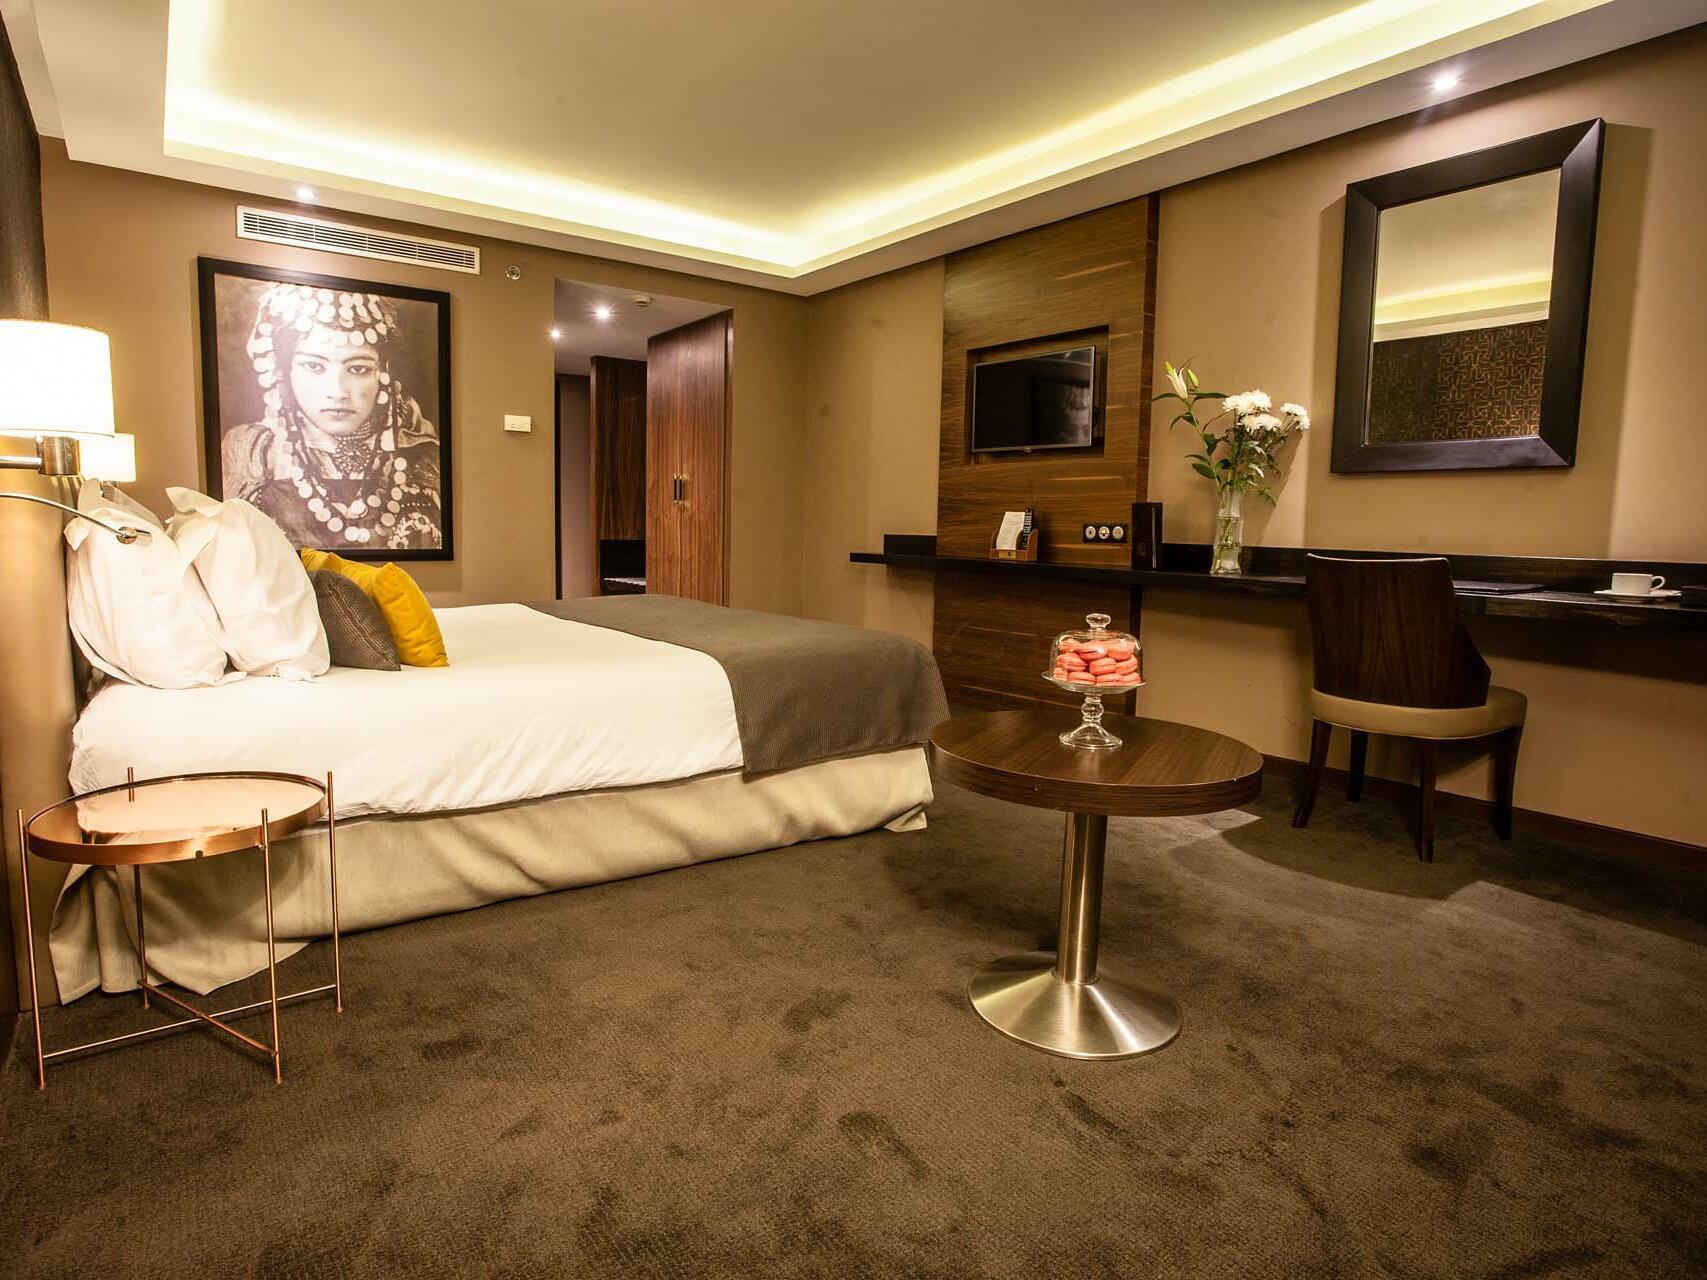 Interior View of the Bedroom - Farah Rabat Hotel